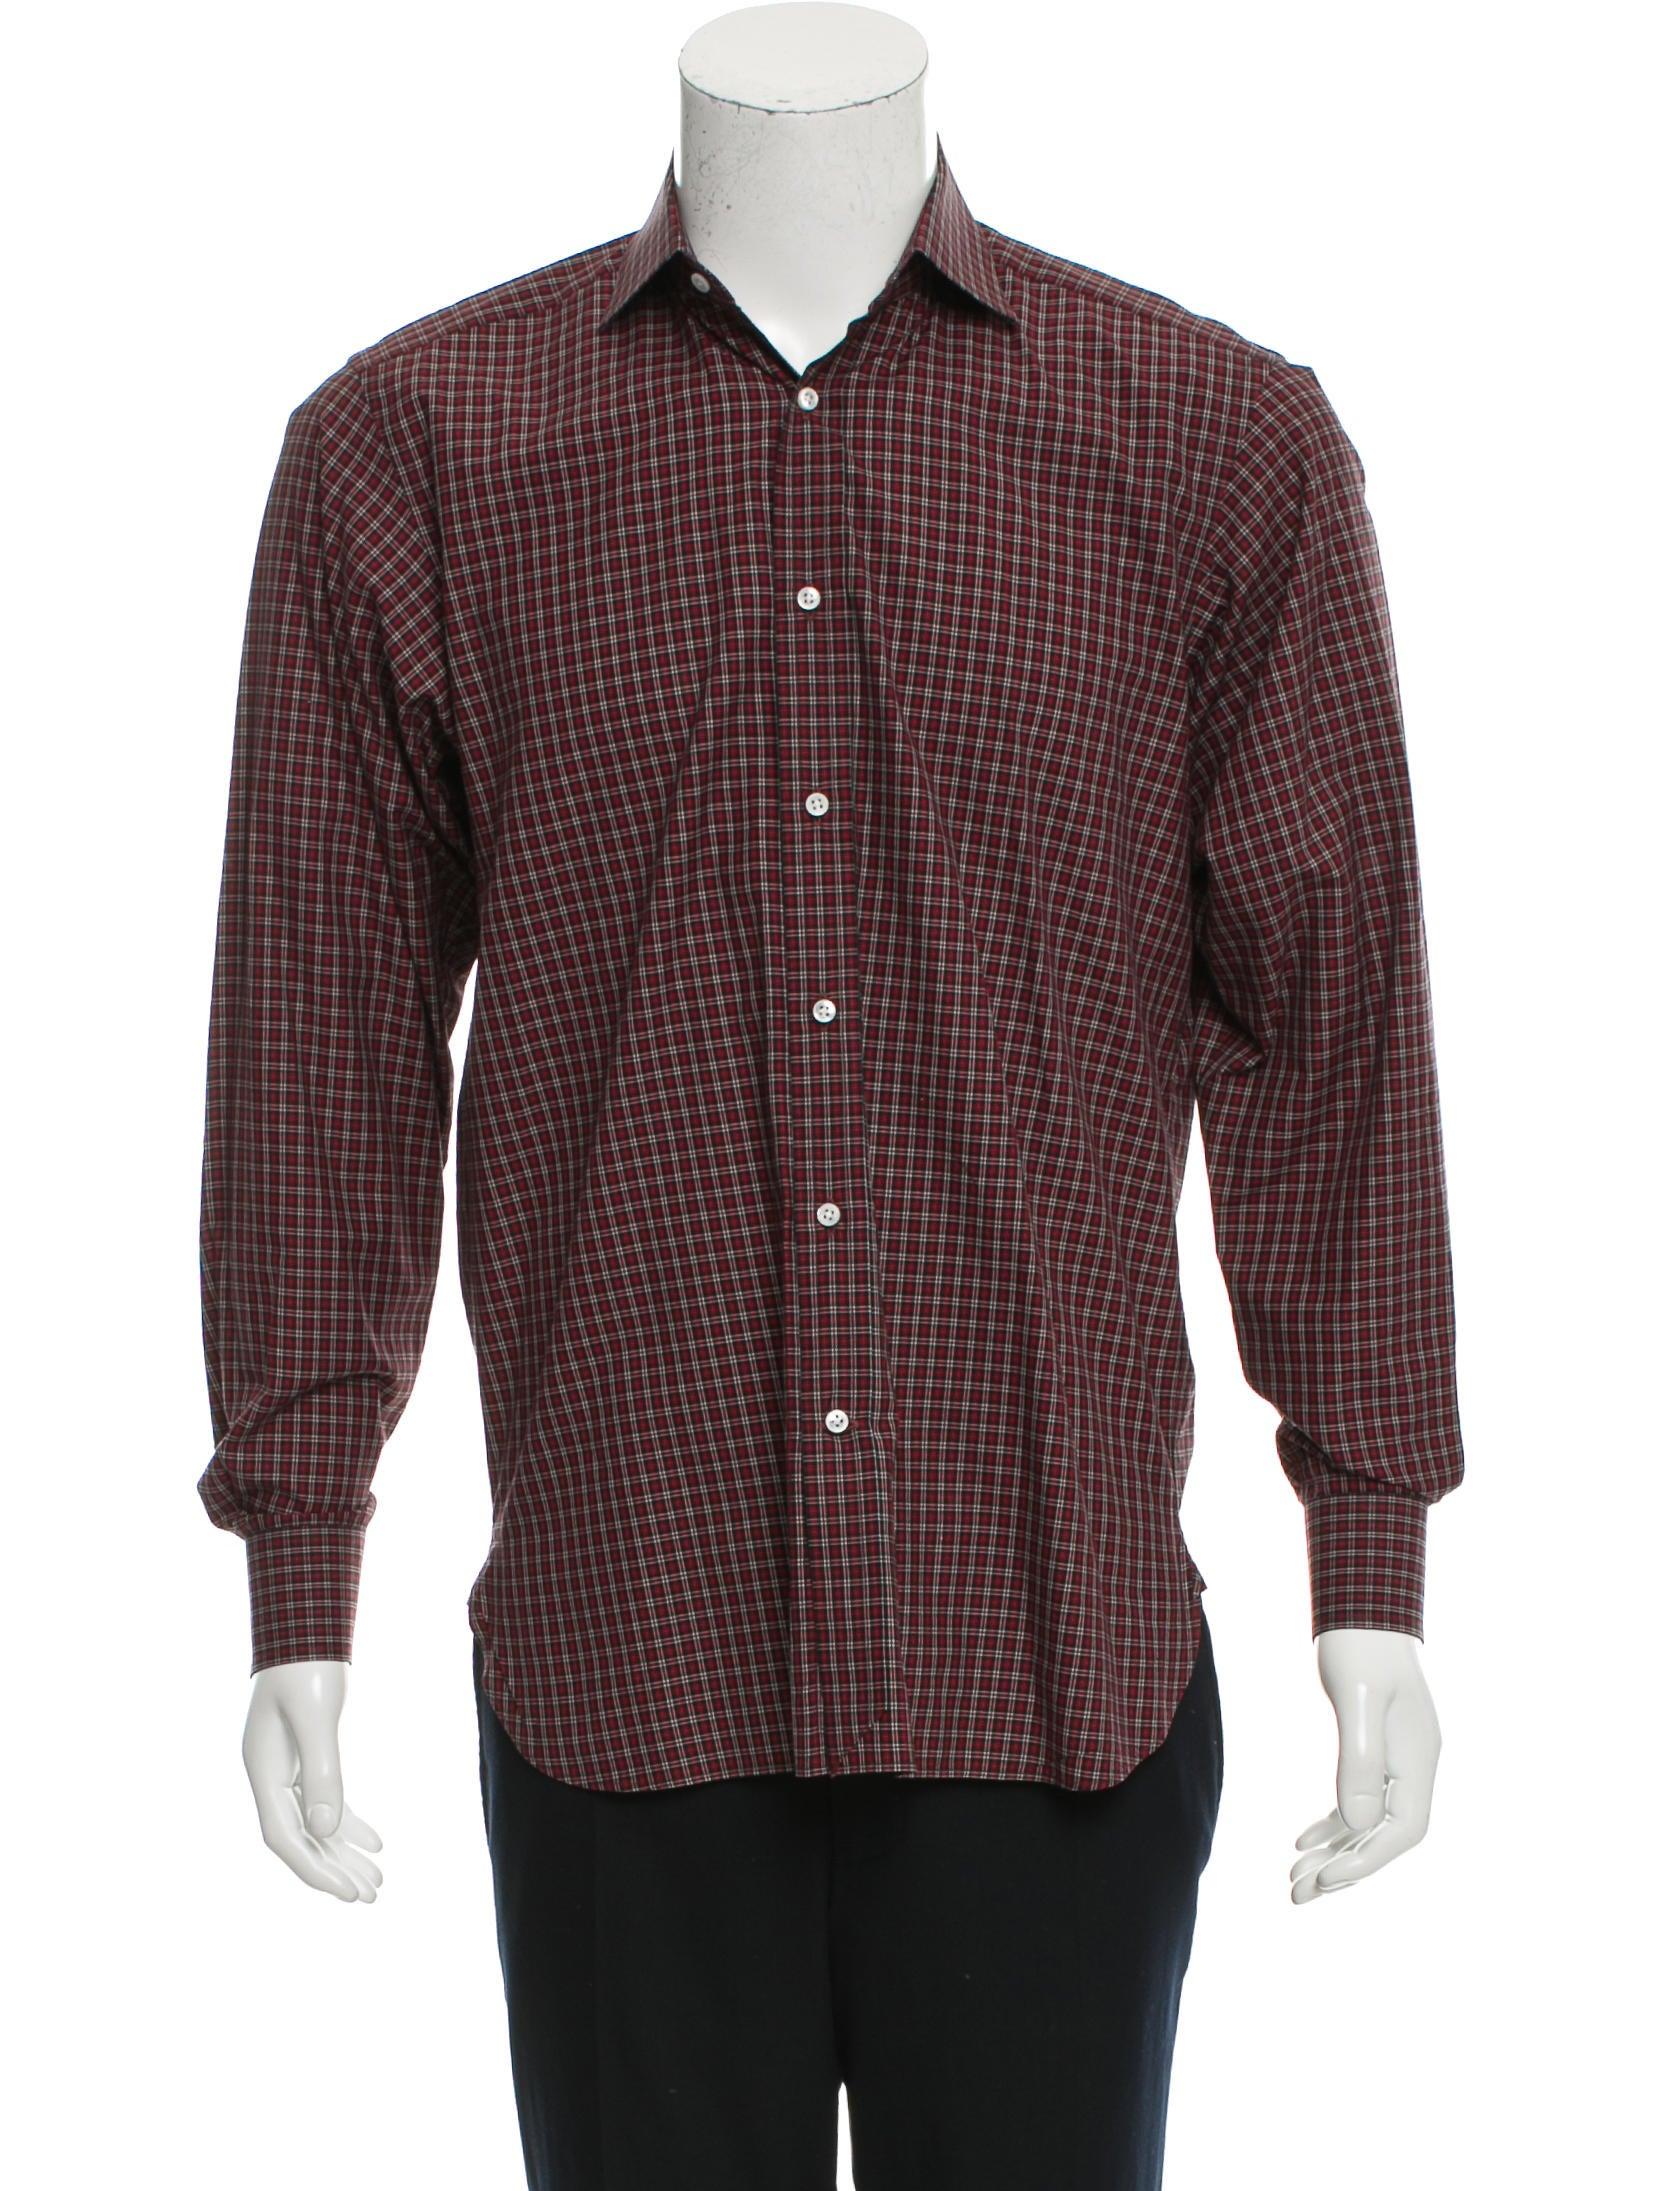 Ralph lauren purple label plaid button up shirt clothing for Lauren ralph lauren mens dress shirts